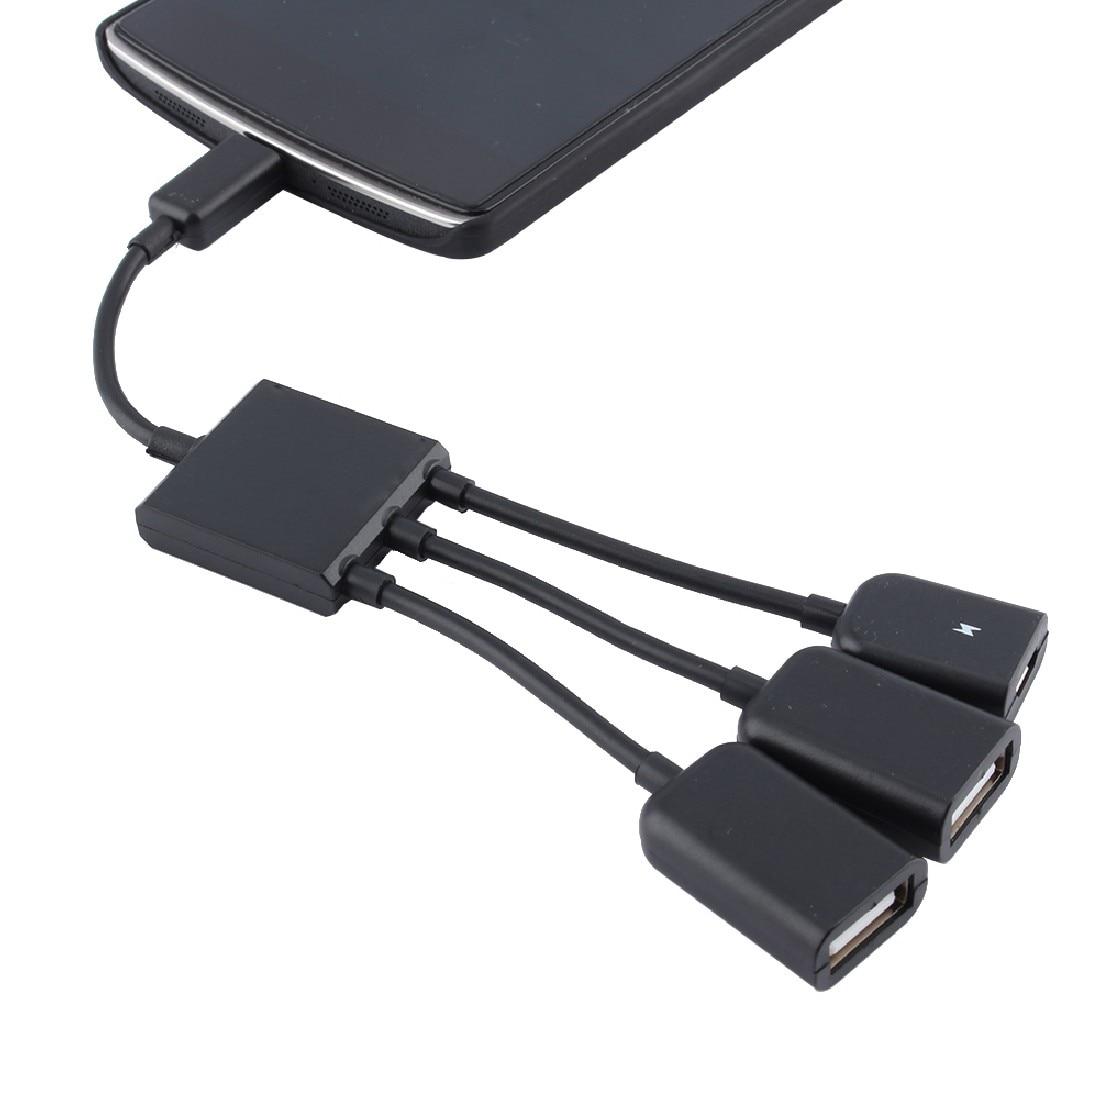 4 Port 3 In 1 Micro Usb Power Opladen Otg Hub Cable Adapter Converter Extender Voor Mobiele Telefoons Voor Samsung Galaxy 80